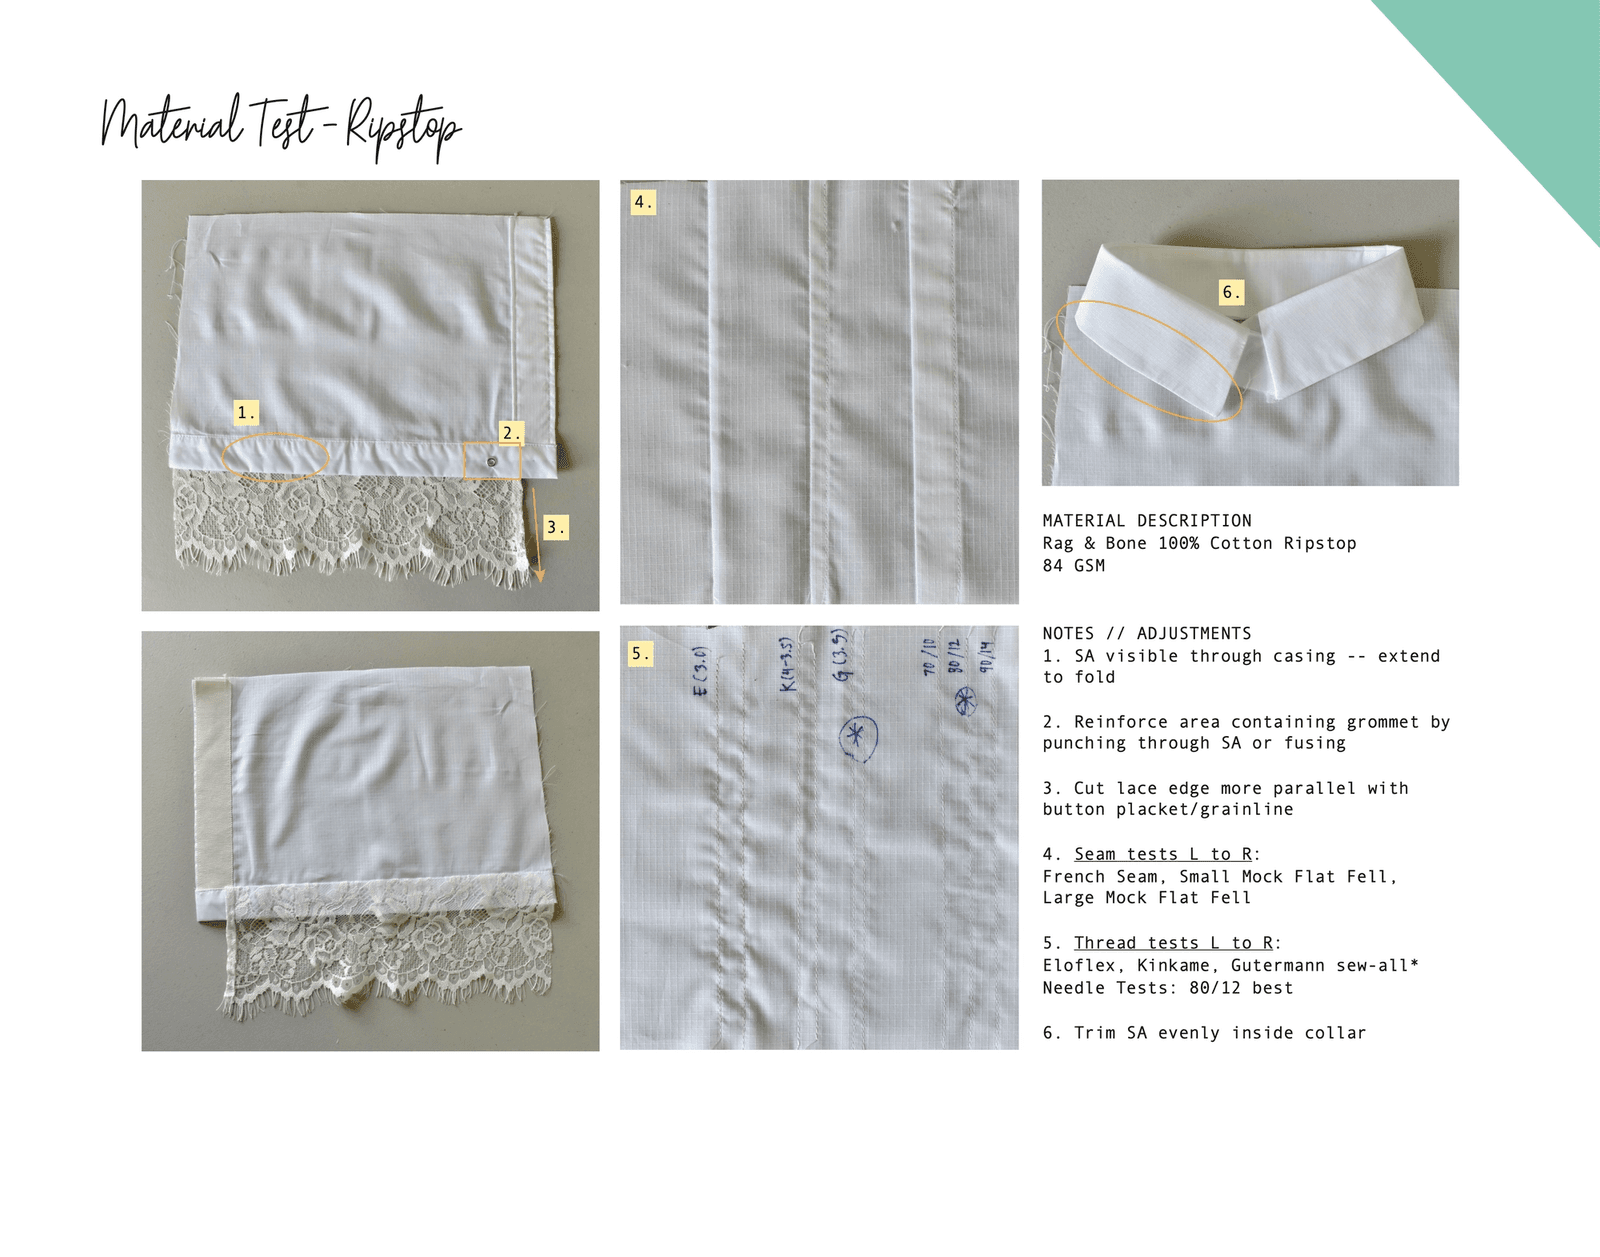 Replication & Material Study of Sacai Shirt